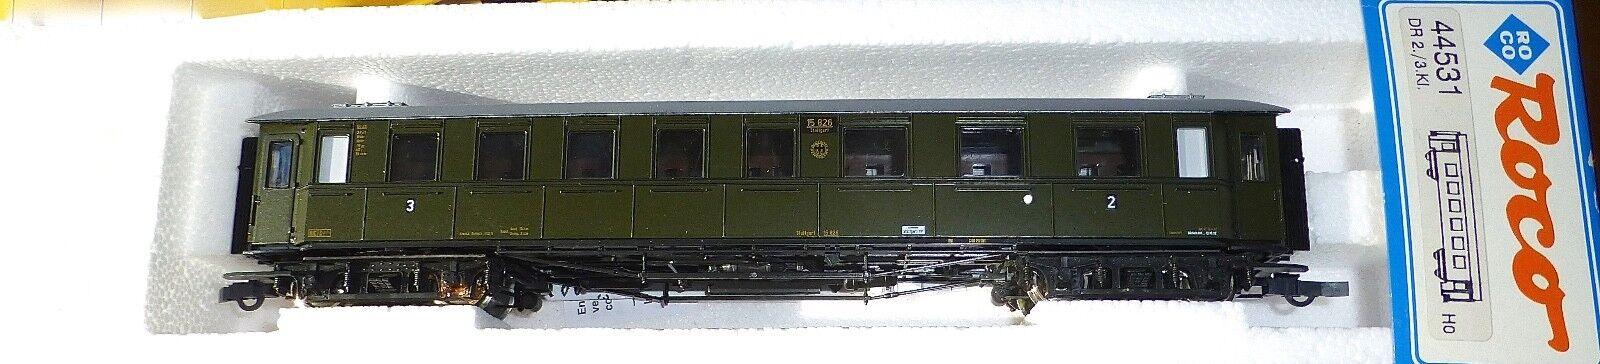 Vagone Treno Direttissimo 23. classee DRG Nem Kkk Roco 44531 H0 1 87 Conf. Orig.